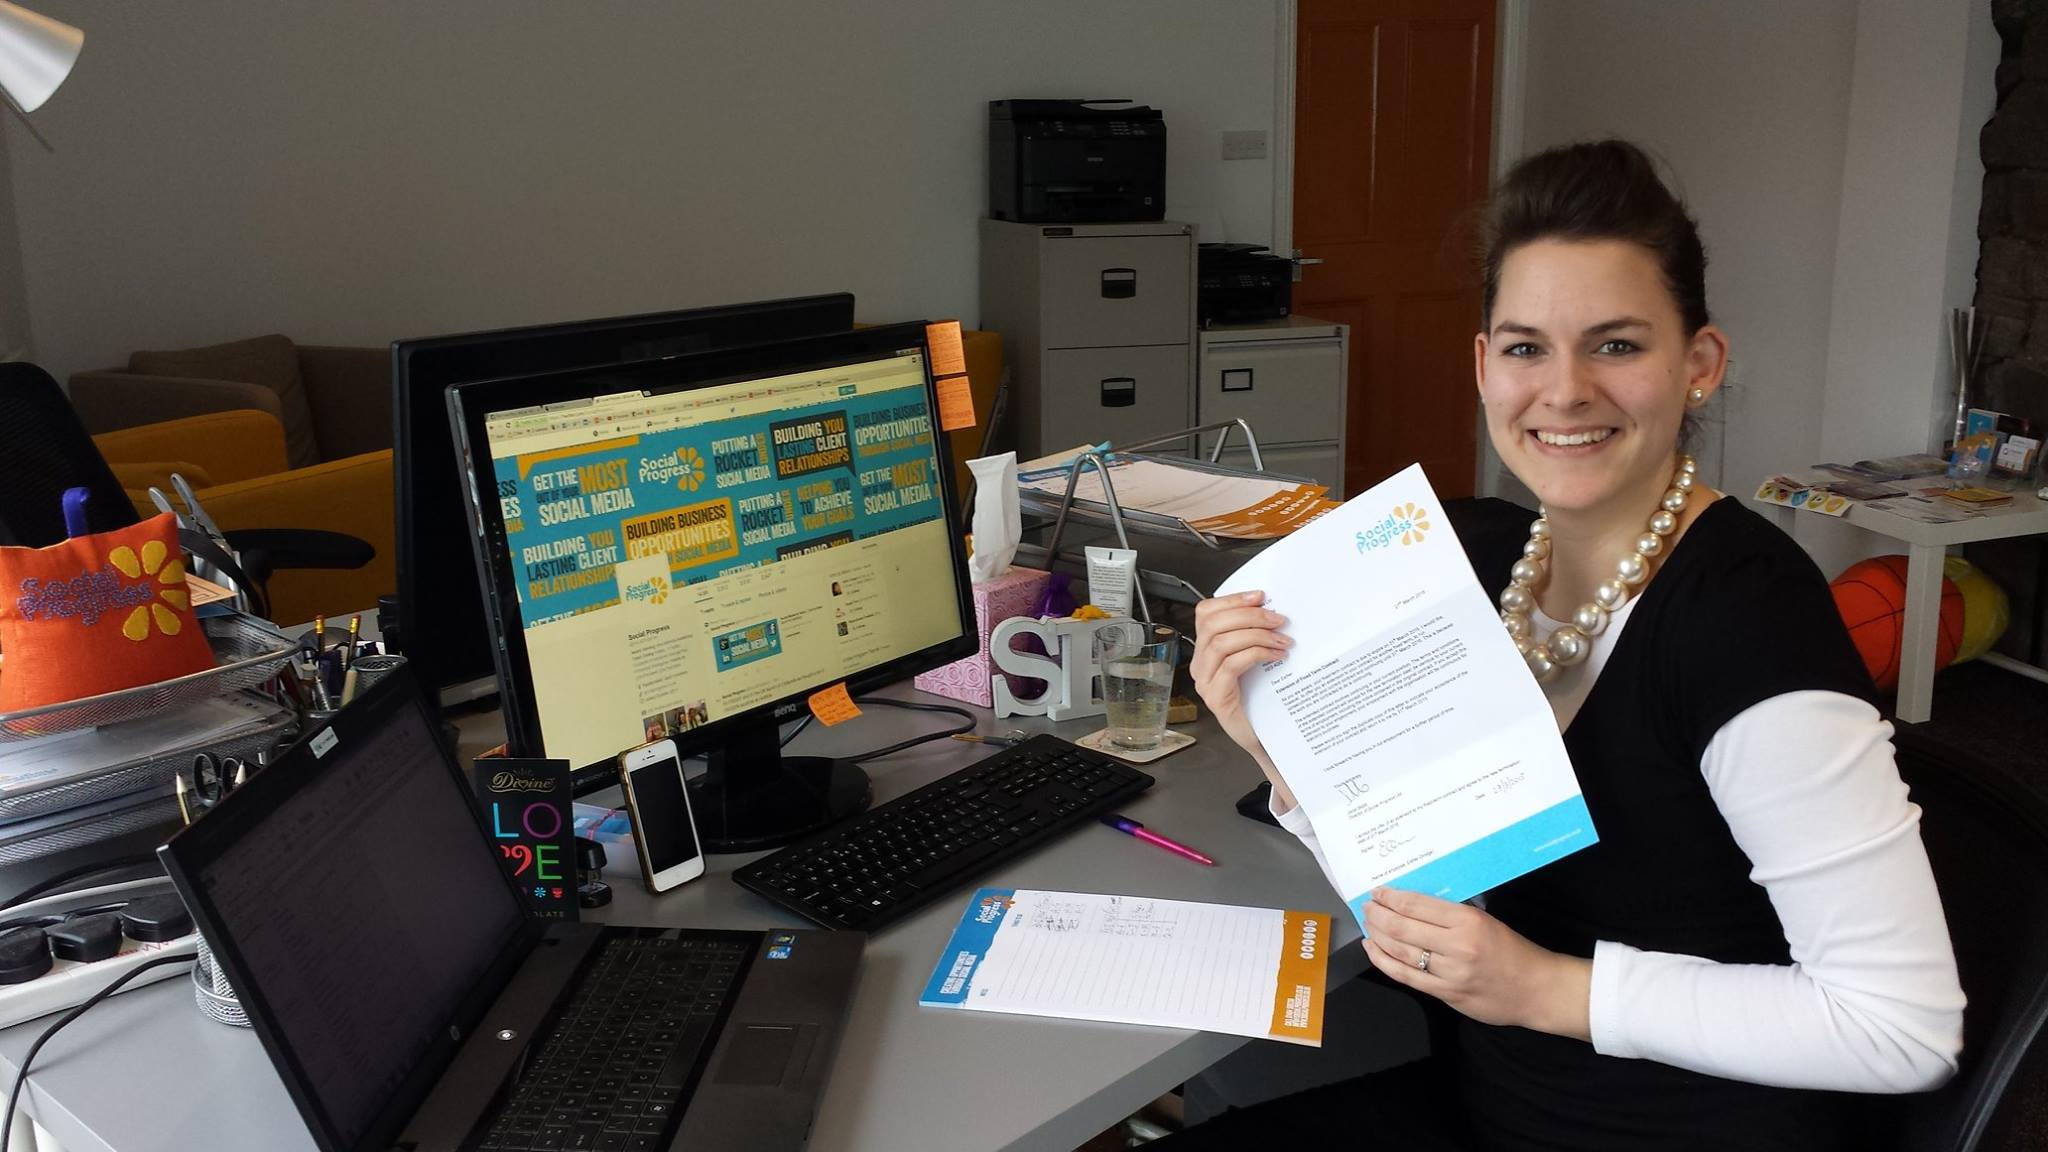 Esther Orridge - Social Progress Ltd - Social Media Account Manager